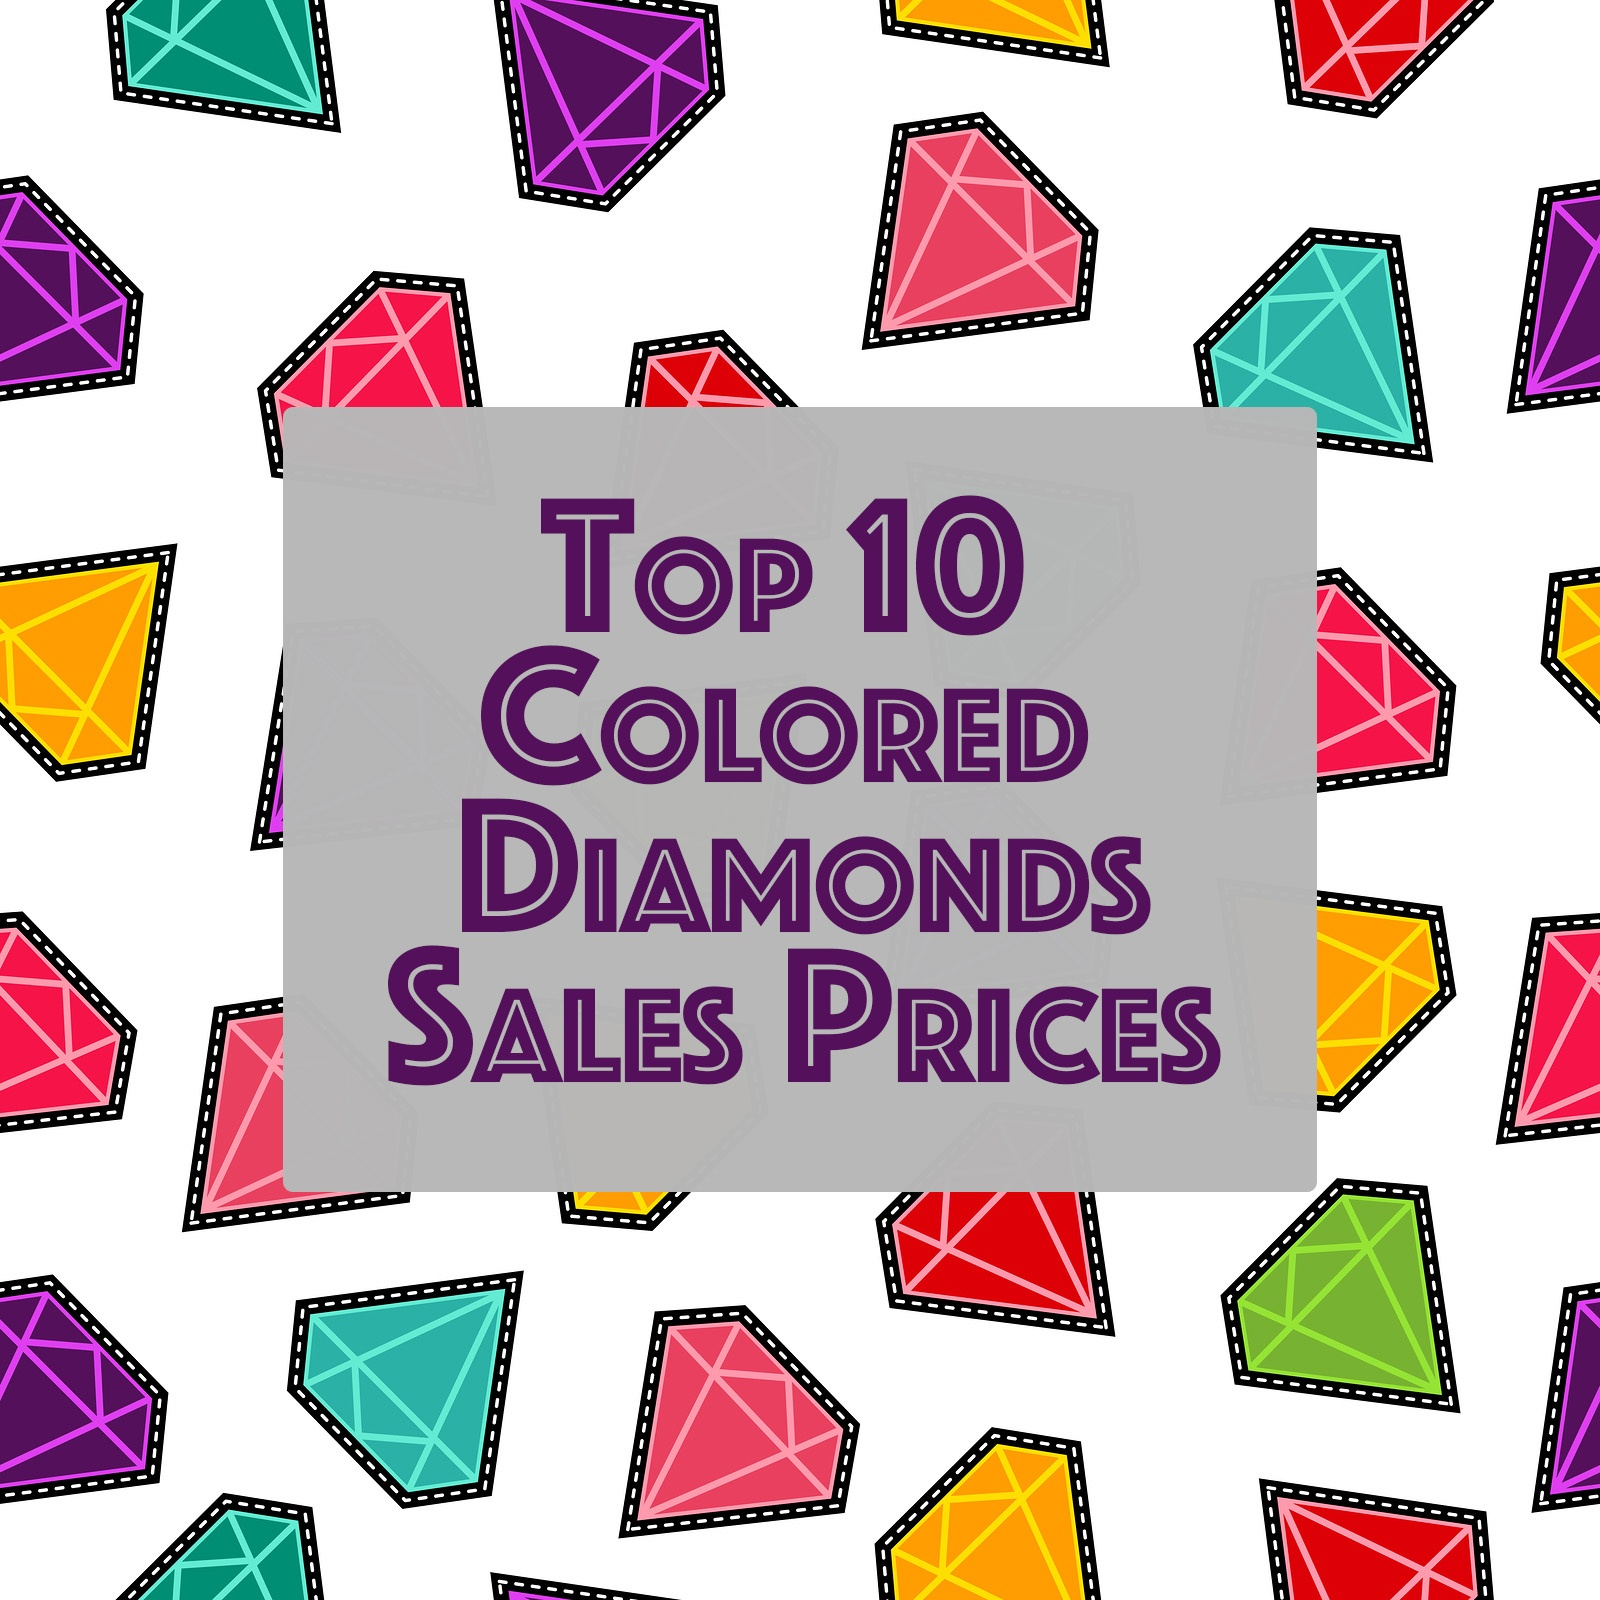 colored diamonds sales prices.jpg